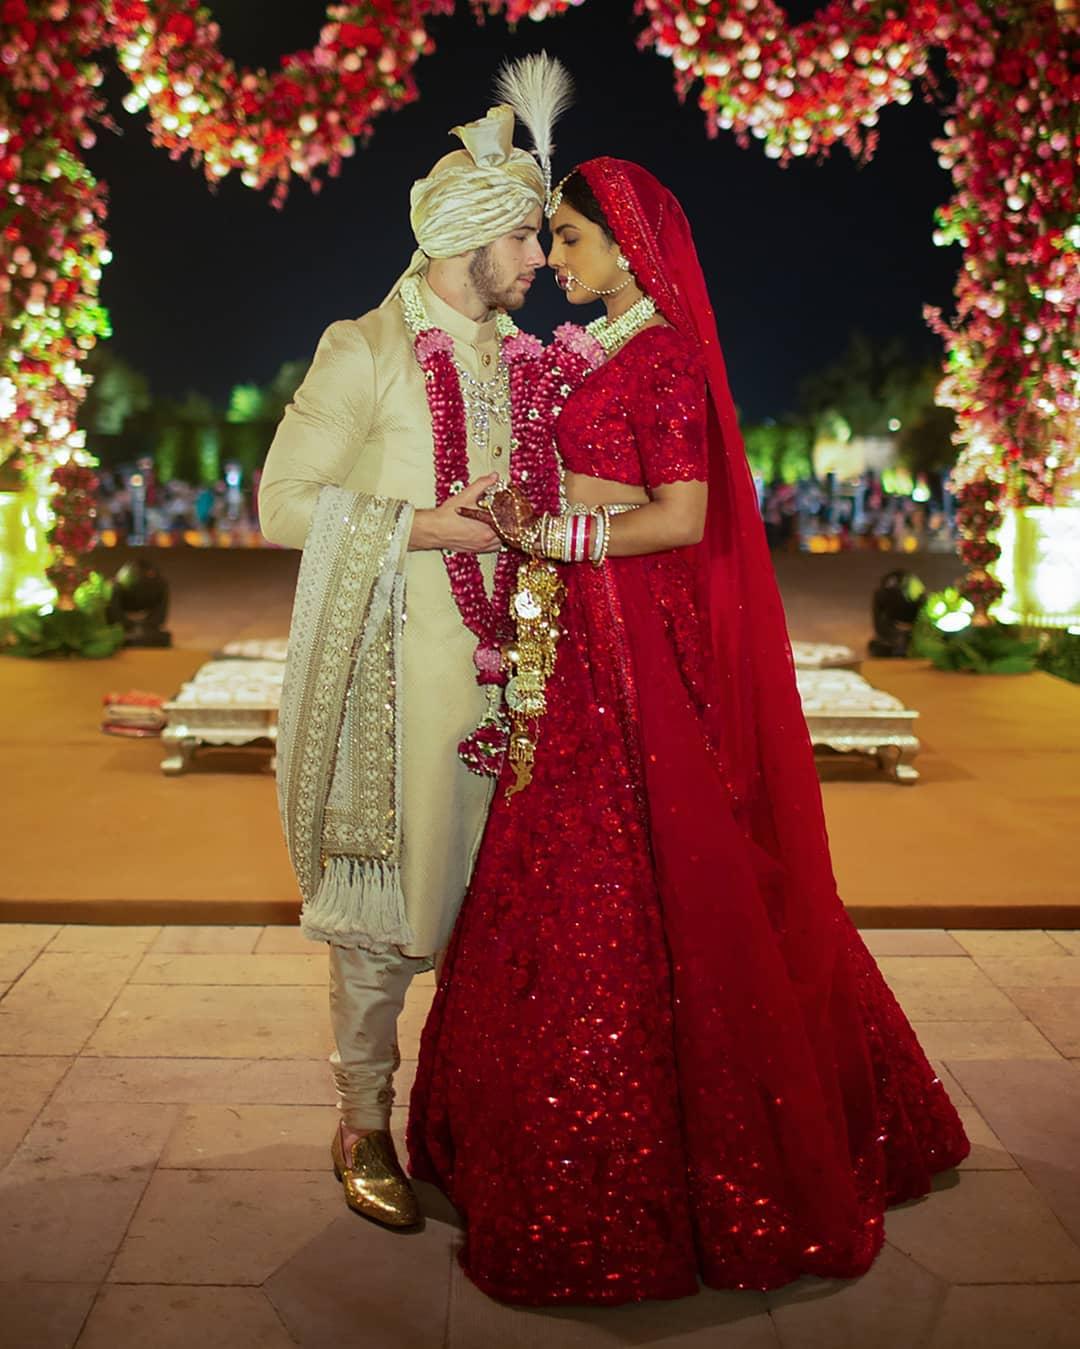 Nickyanka christain ceremony hindu ceremony Ralph Lauren bride groom season Priyanka Chopra Nick Jonas wedding marriage jodhour bollywood Hollywood gown designer party guest wedding dress royal wedding